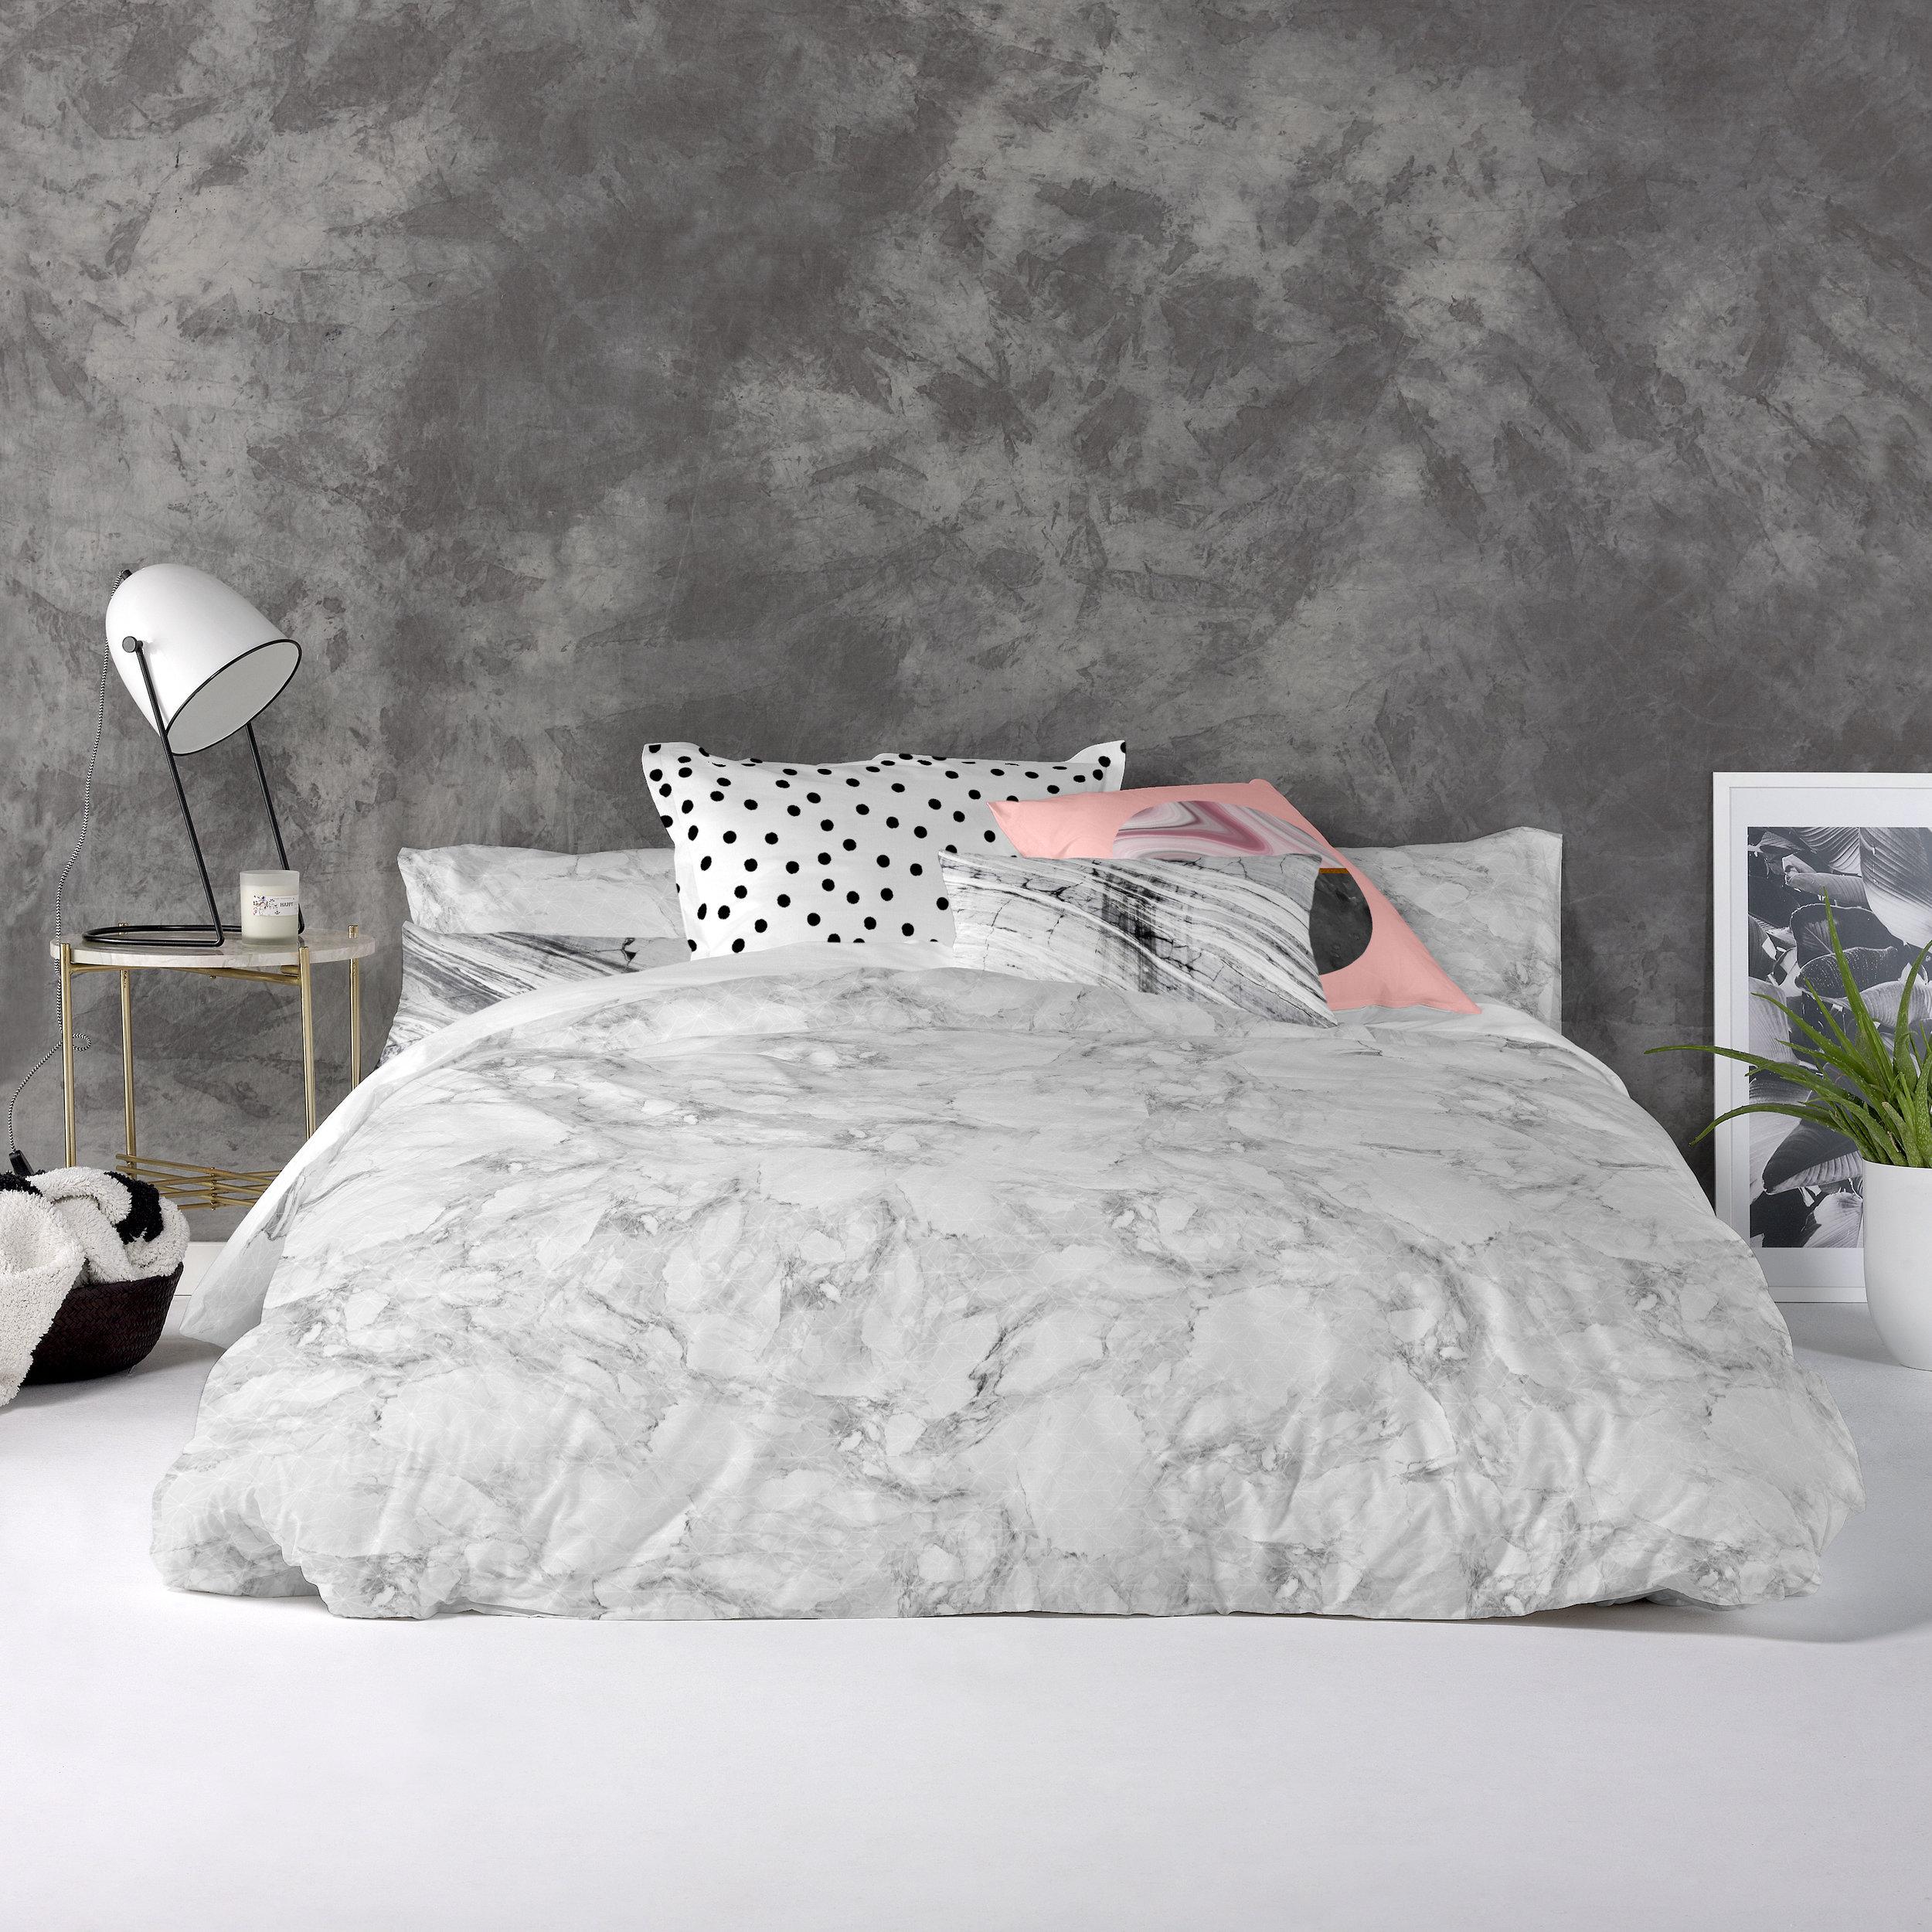 30003782_01_Blanc-Essence-Marble-Bedding-Set.jpg